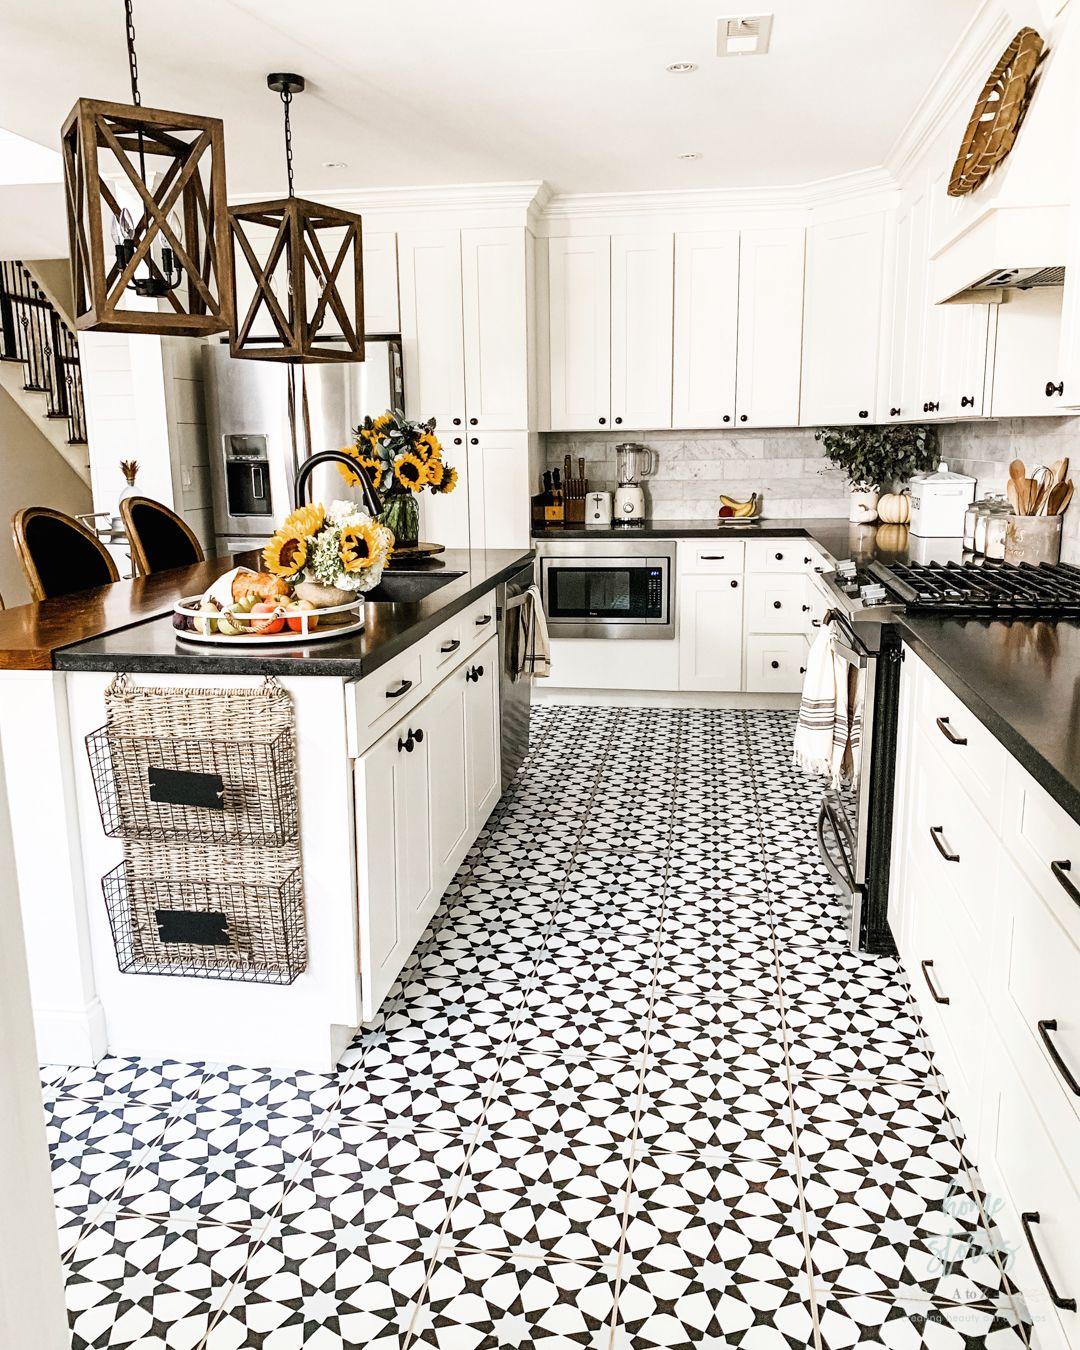 Early Fall Kitchen Decorating Ideas Sunflowers & Hydrangeas in ...